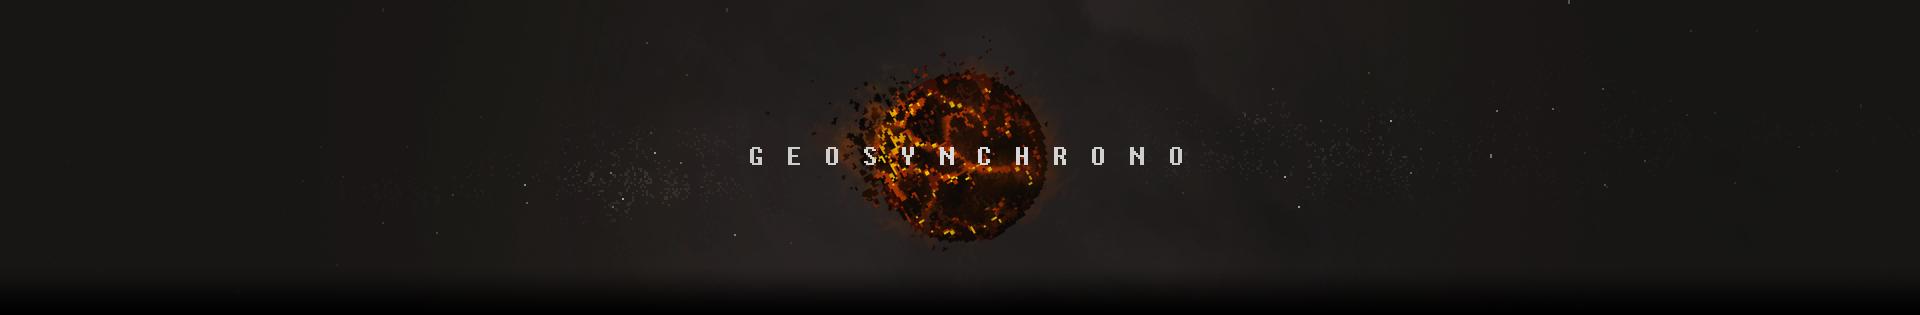 Geosynchrono